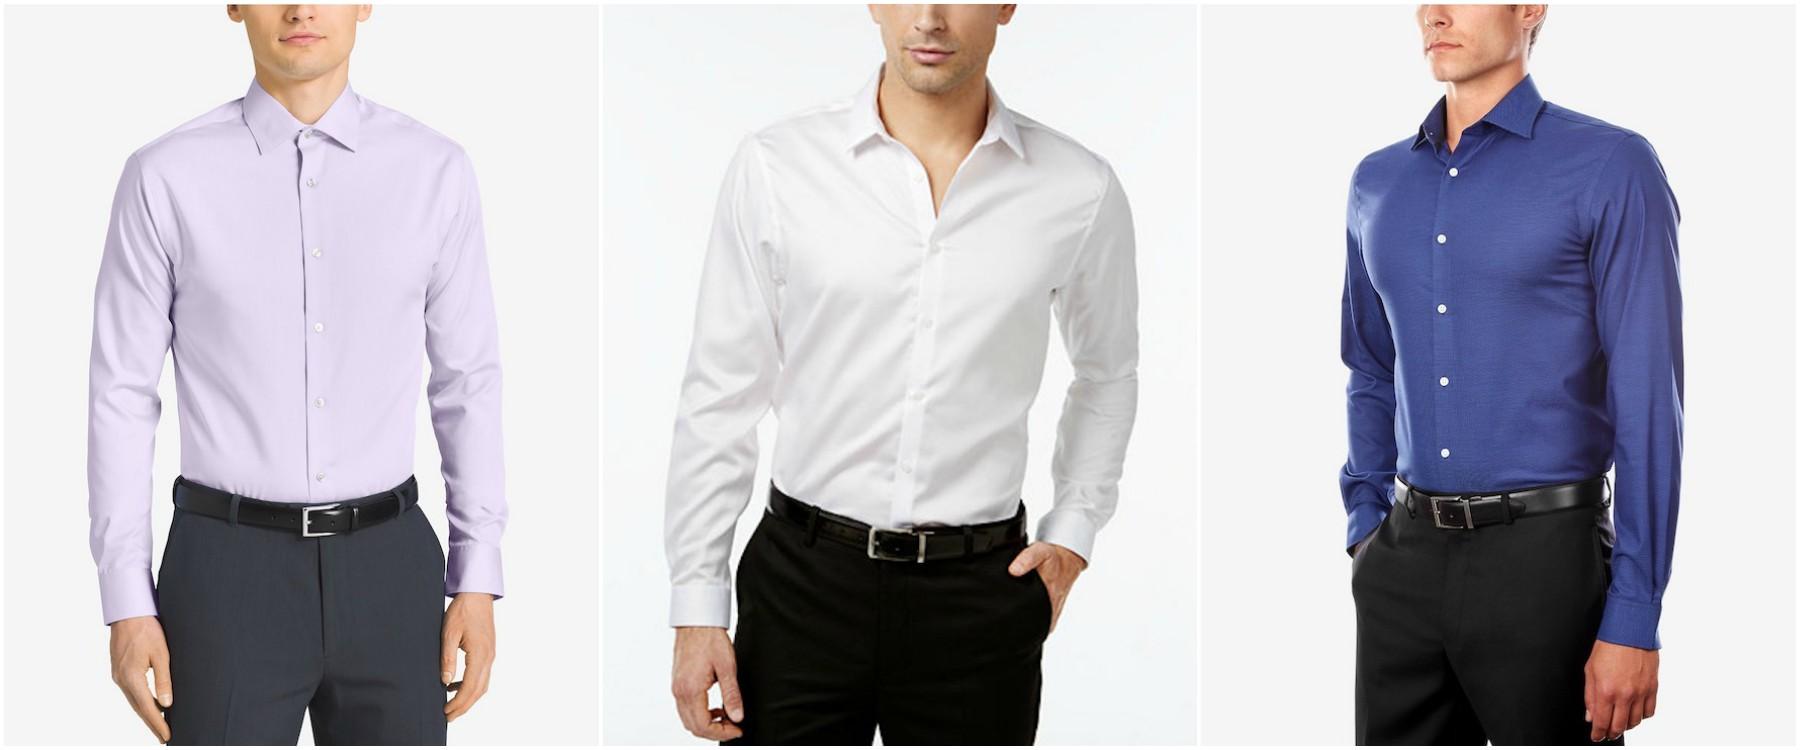 macys non iron shirt